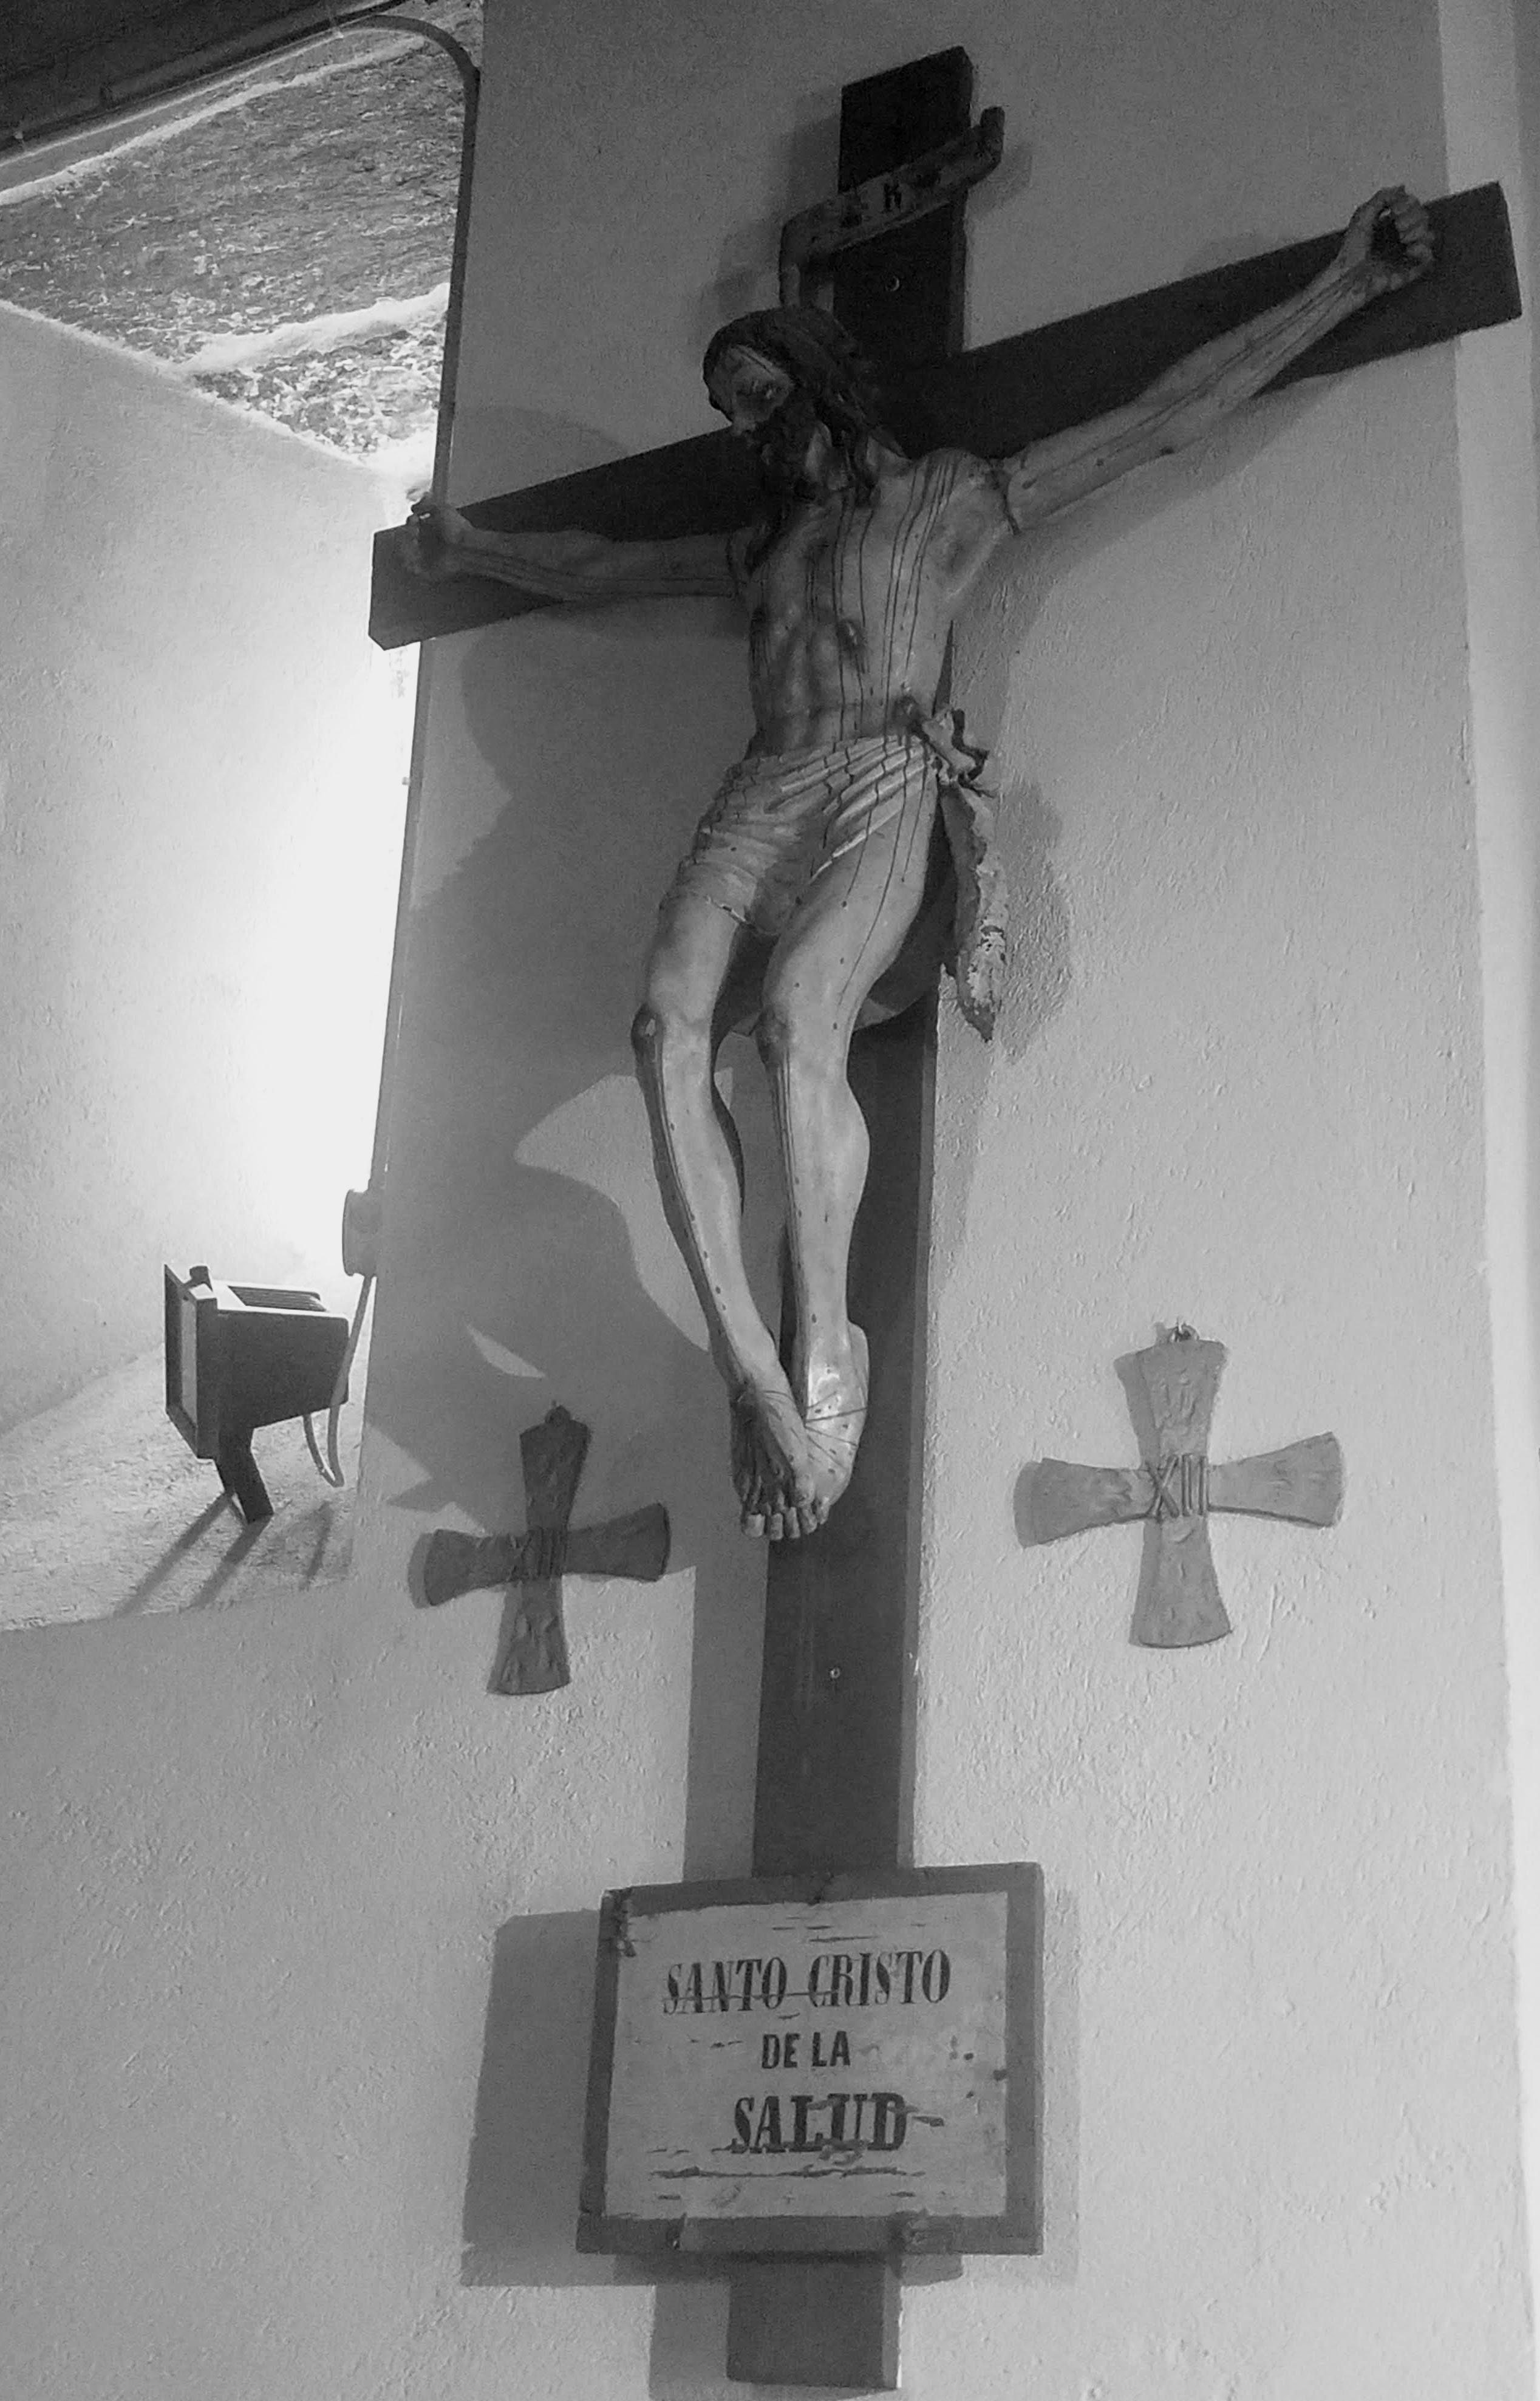 Camino San Paio Crucifix